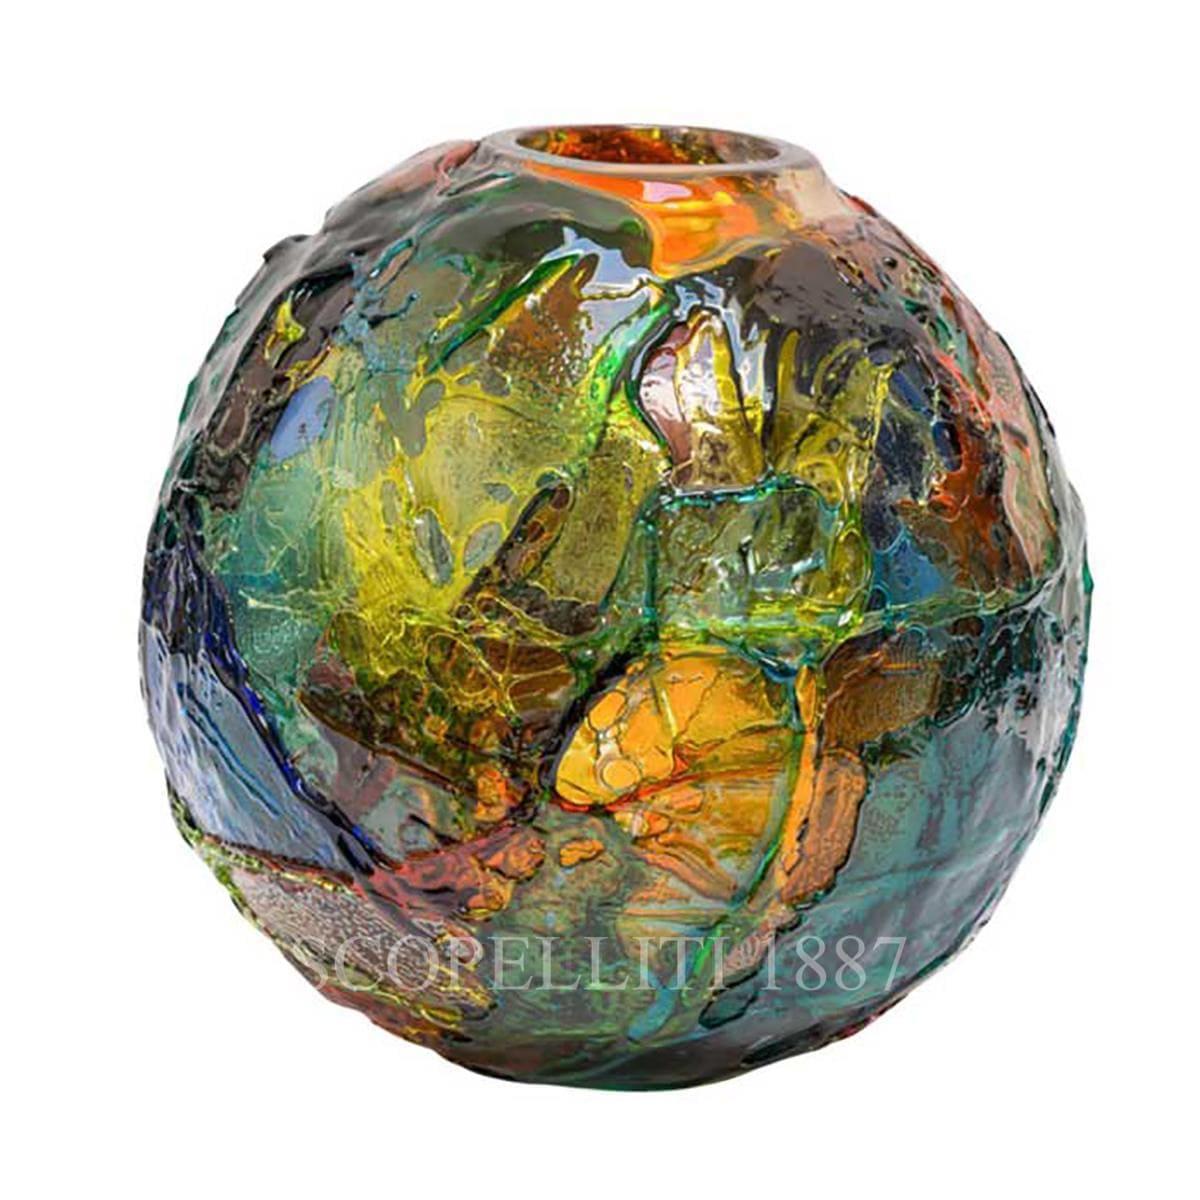 venini italian designer geacolor vase